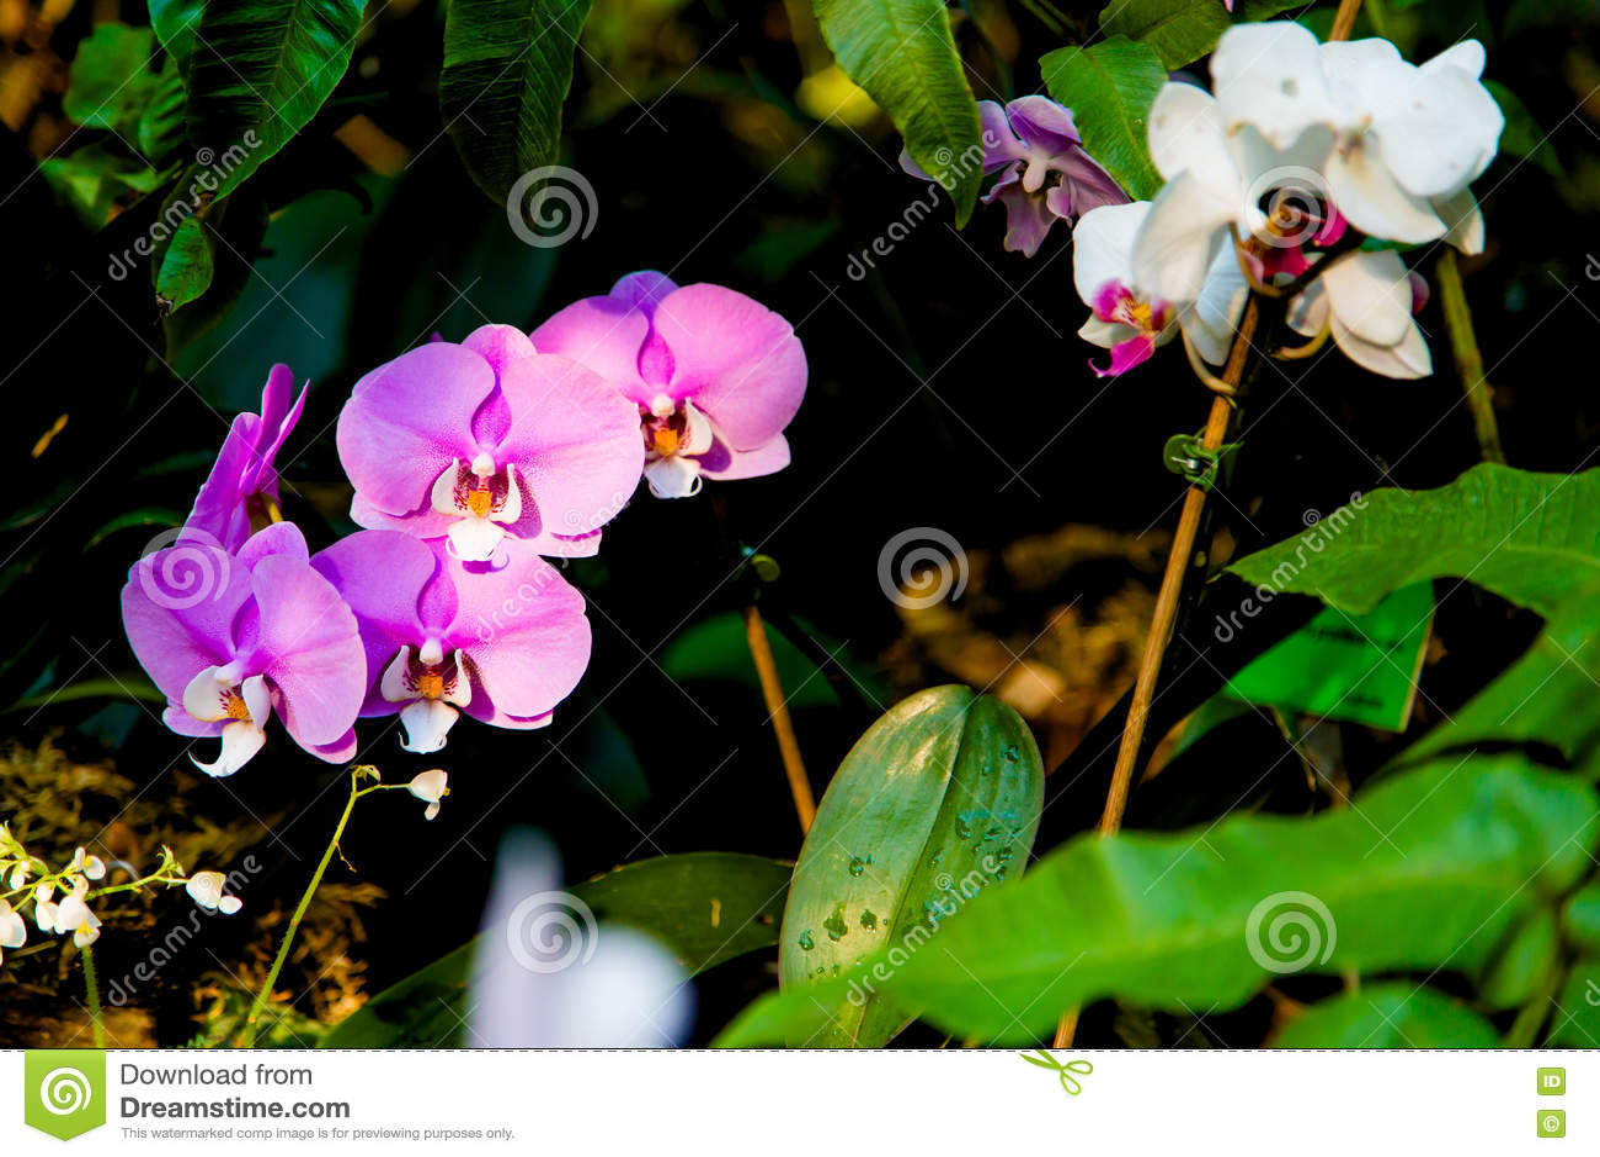 Beautiful exotic flowers in tropical jungle stock photo image of download beautiful exotic flowers in tropical jungle stock photo image of plant interior izmirmasajfo